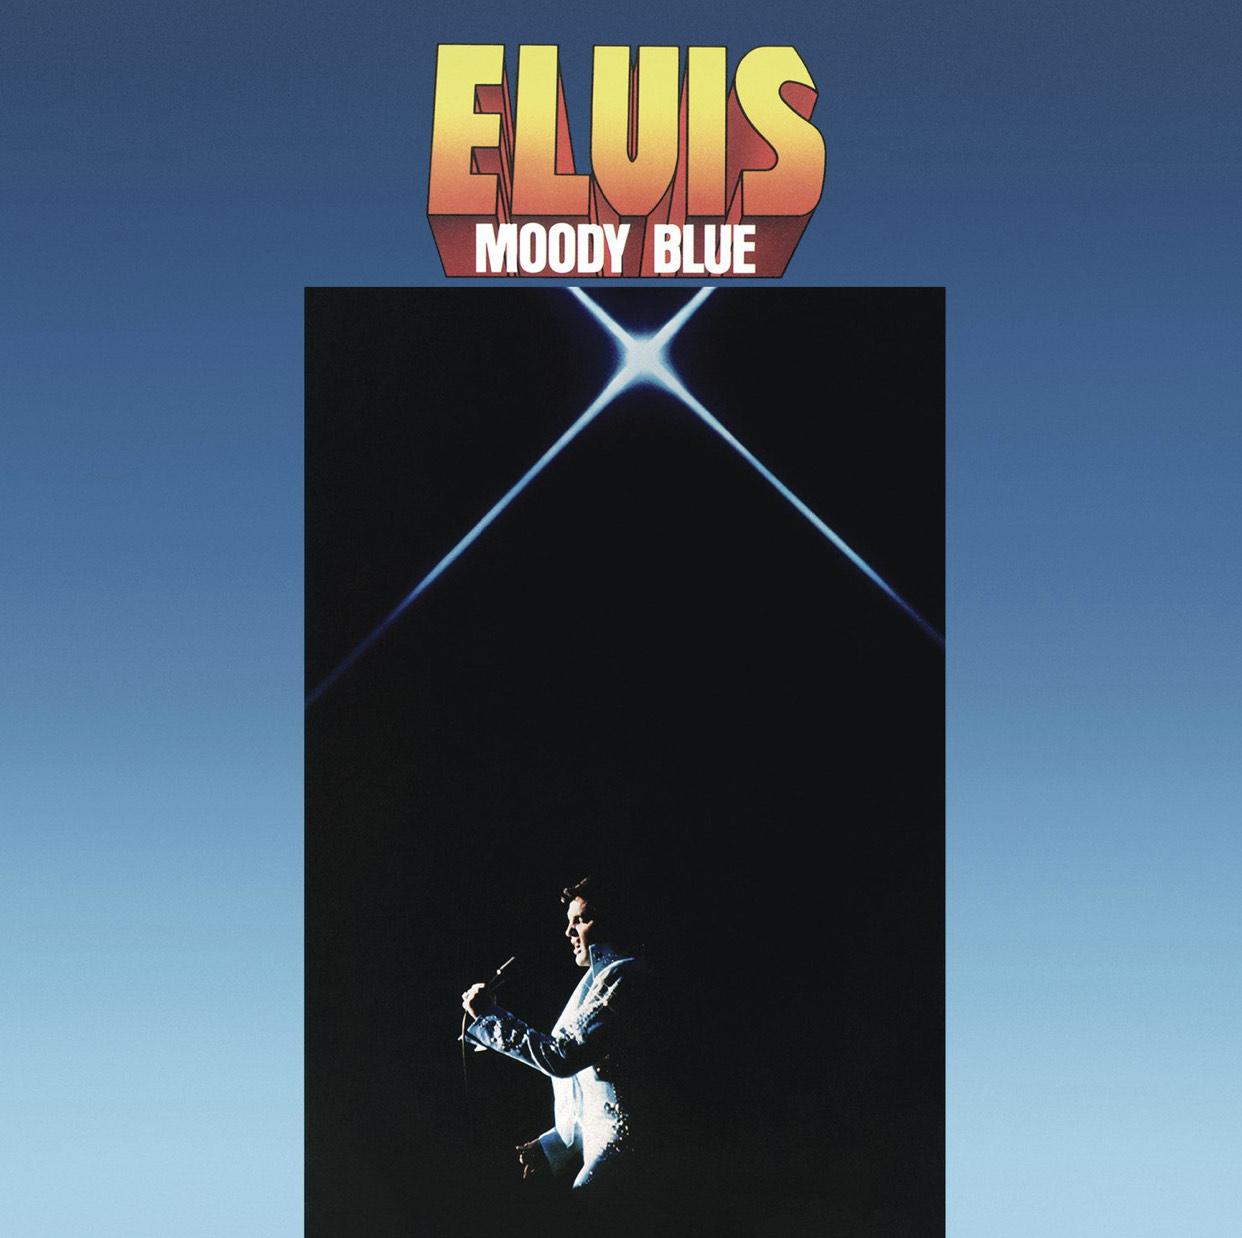 [Prime] Elvis Presley - Moody Blue - 40th Anniversary Clear Blue Vinyl (LP)